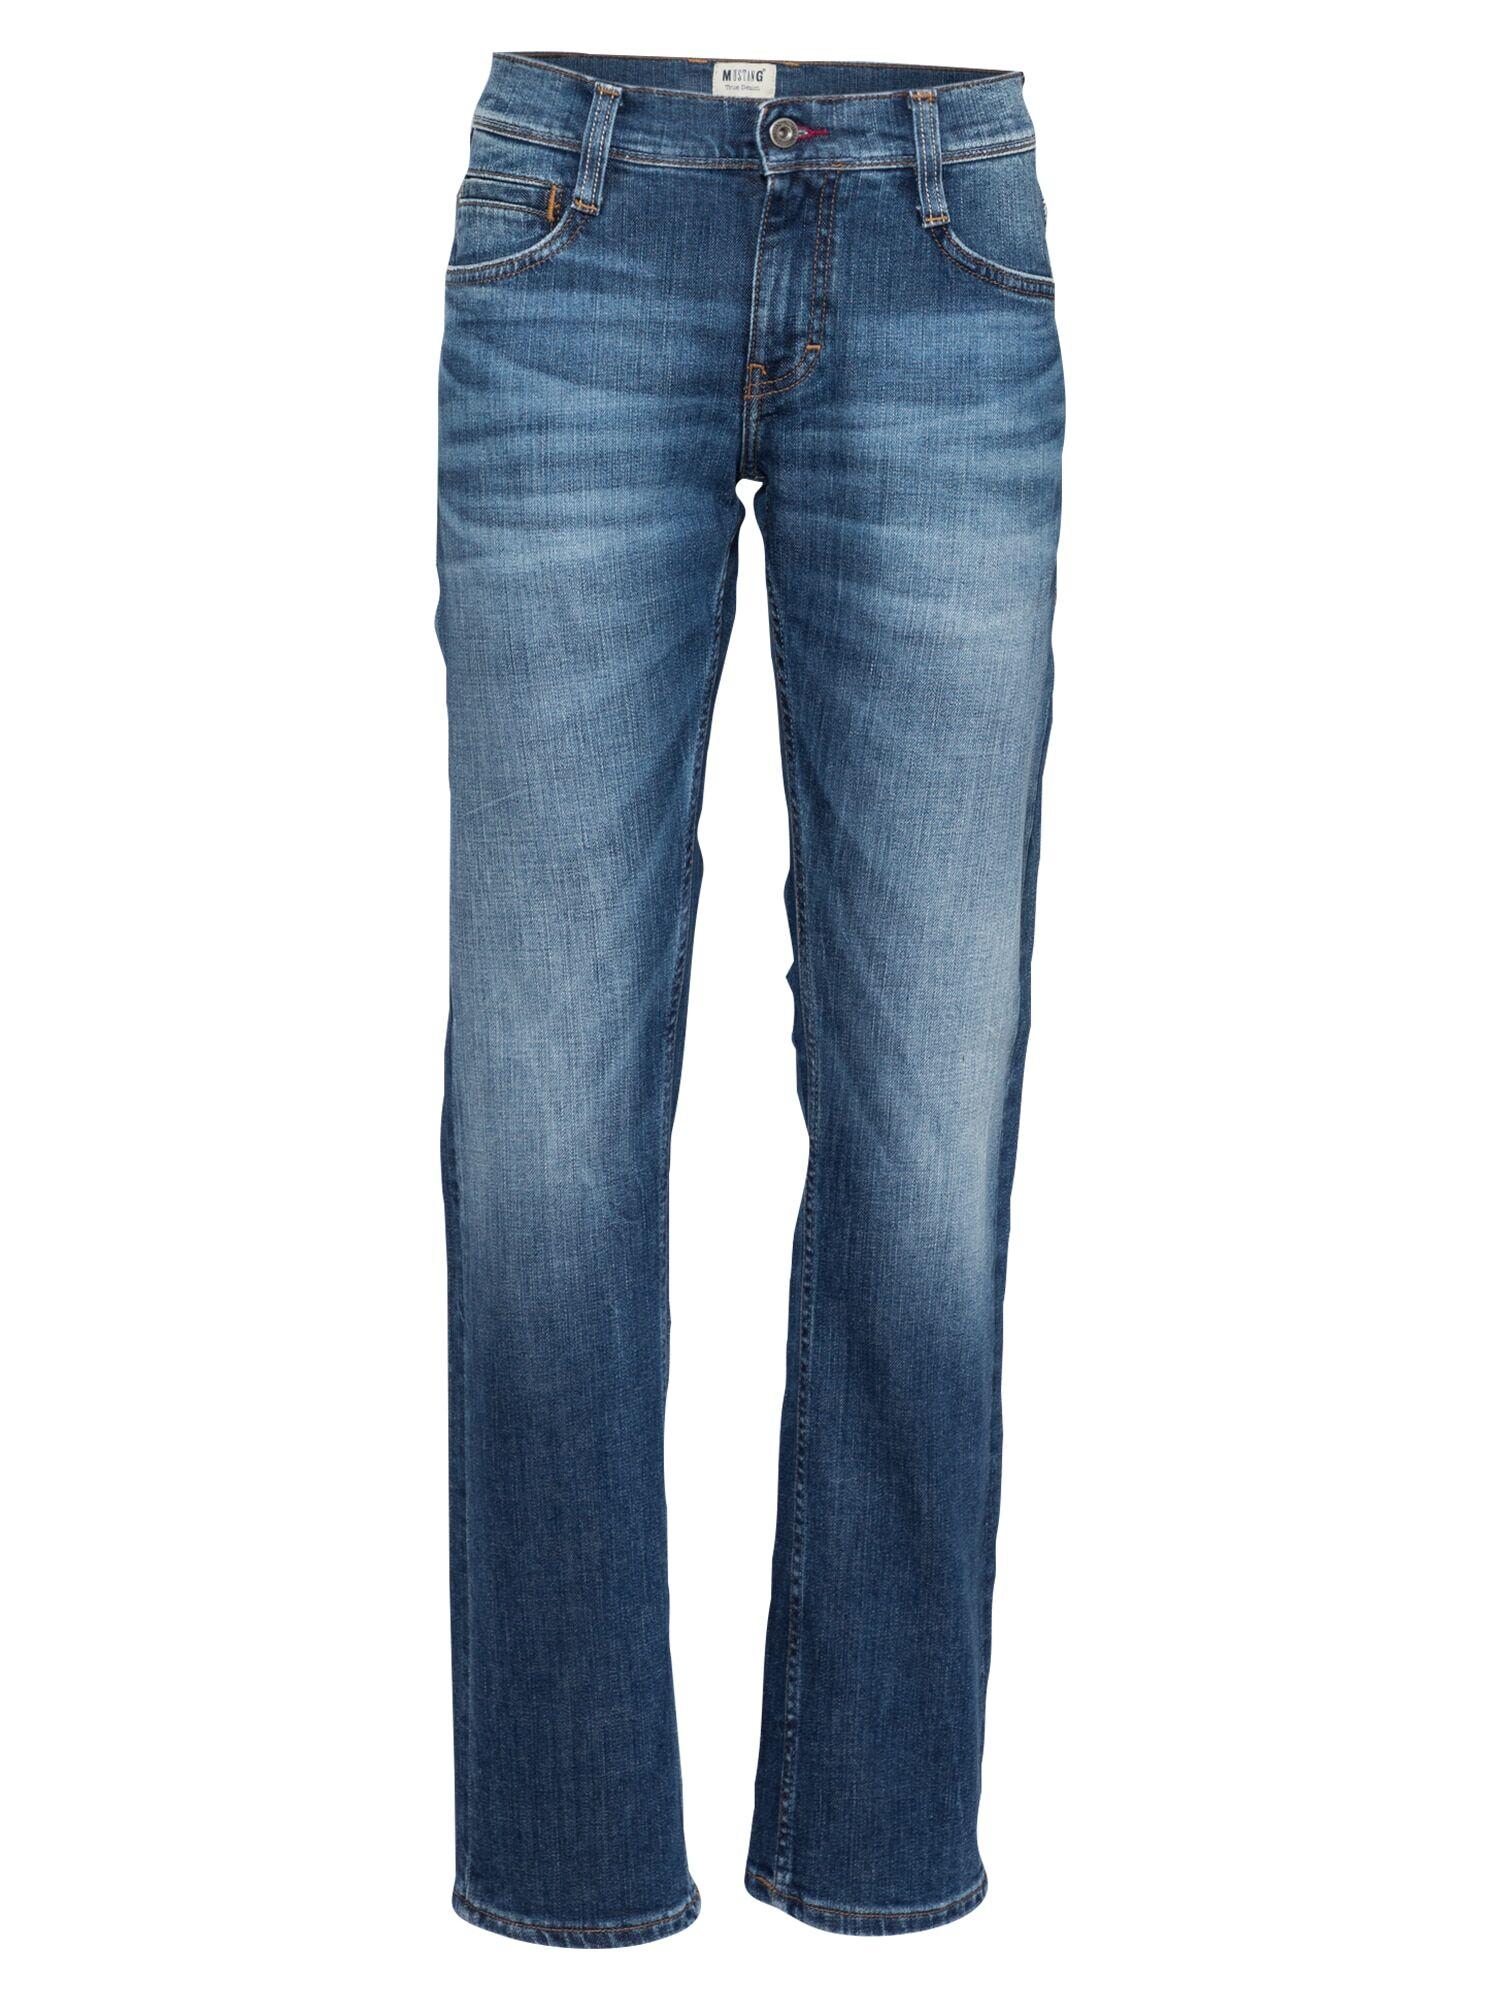 MUSTANG Jean 'Oregon '  - Bleu - Taille: 29 - male